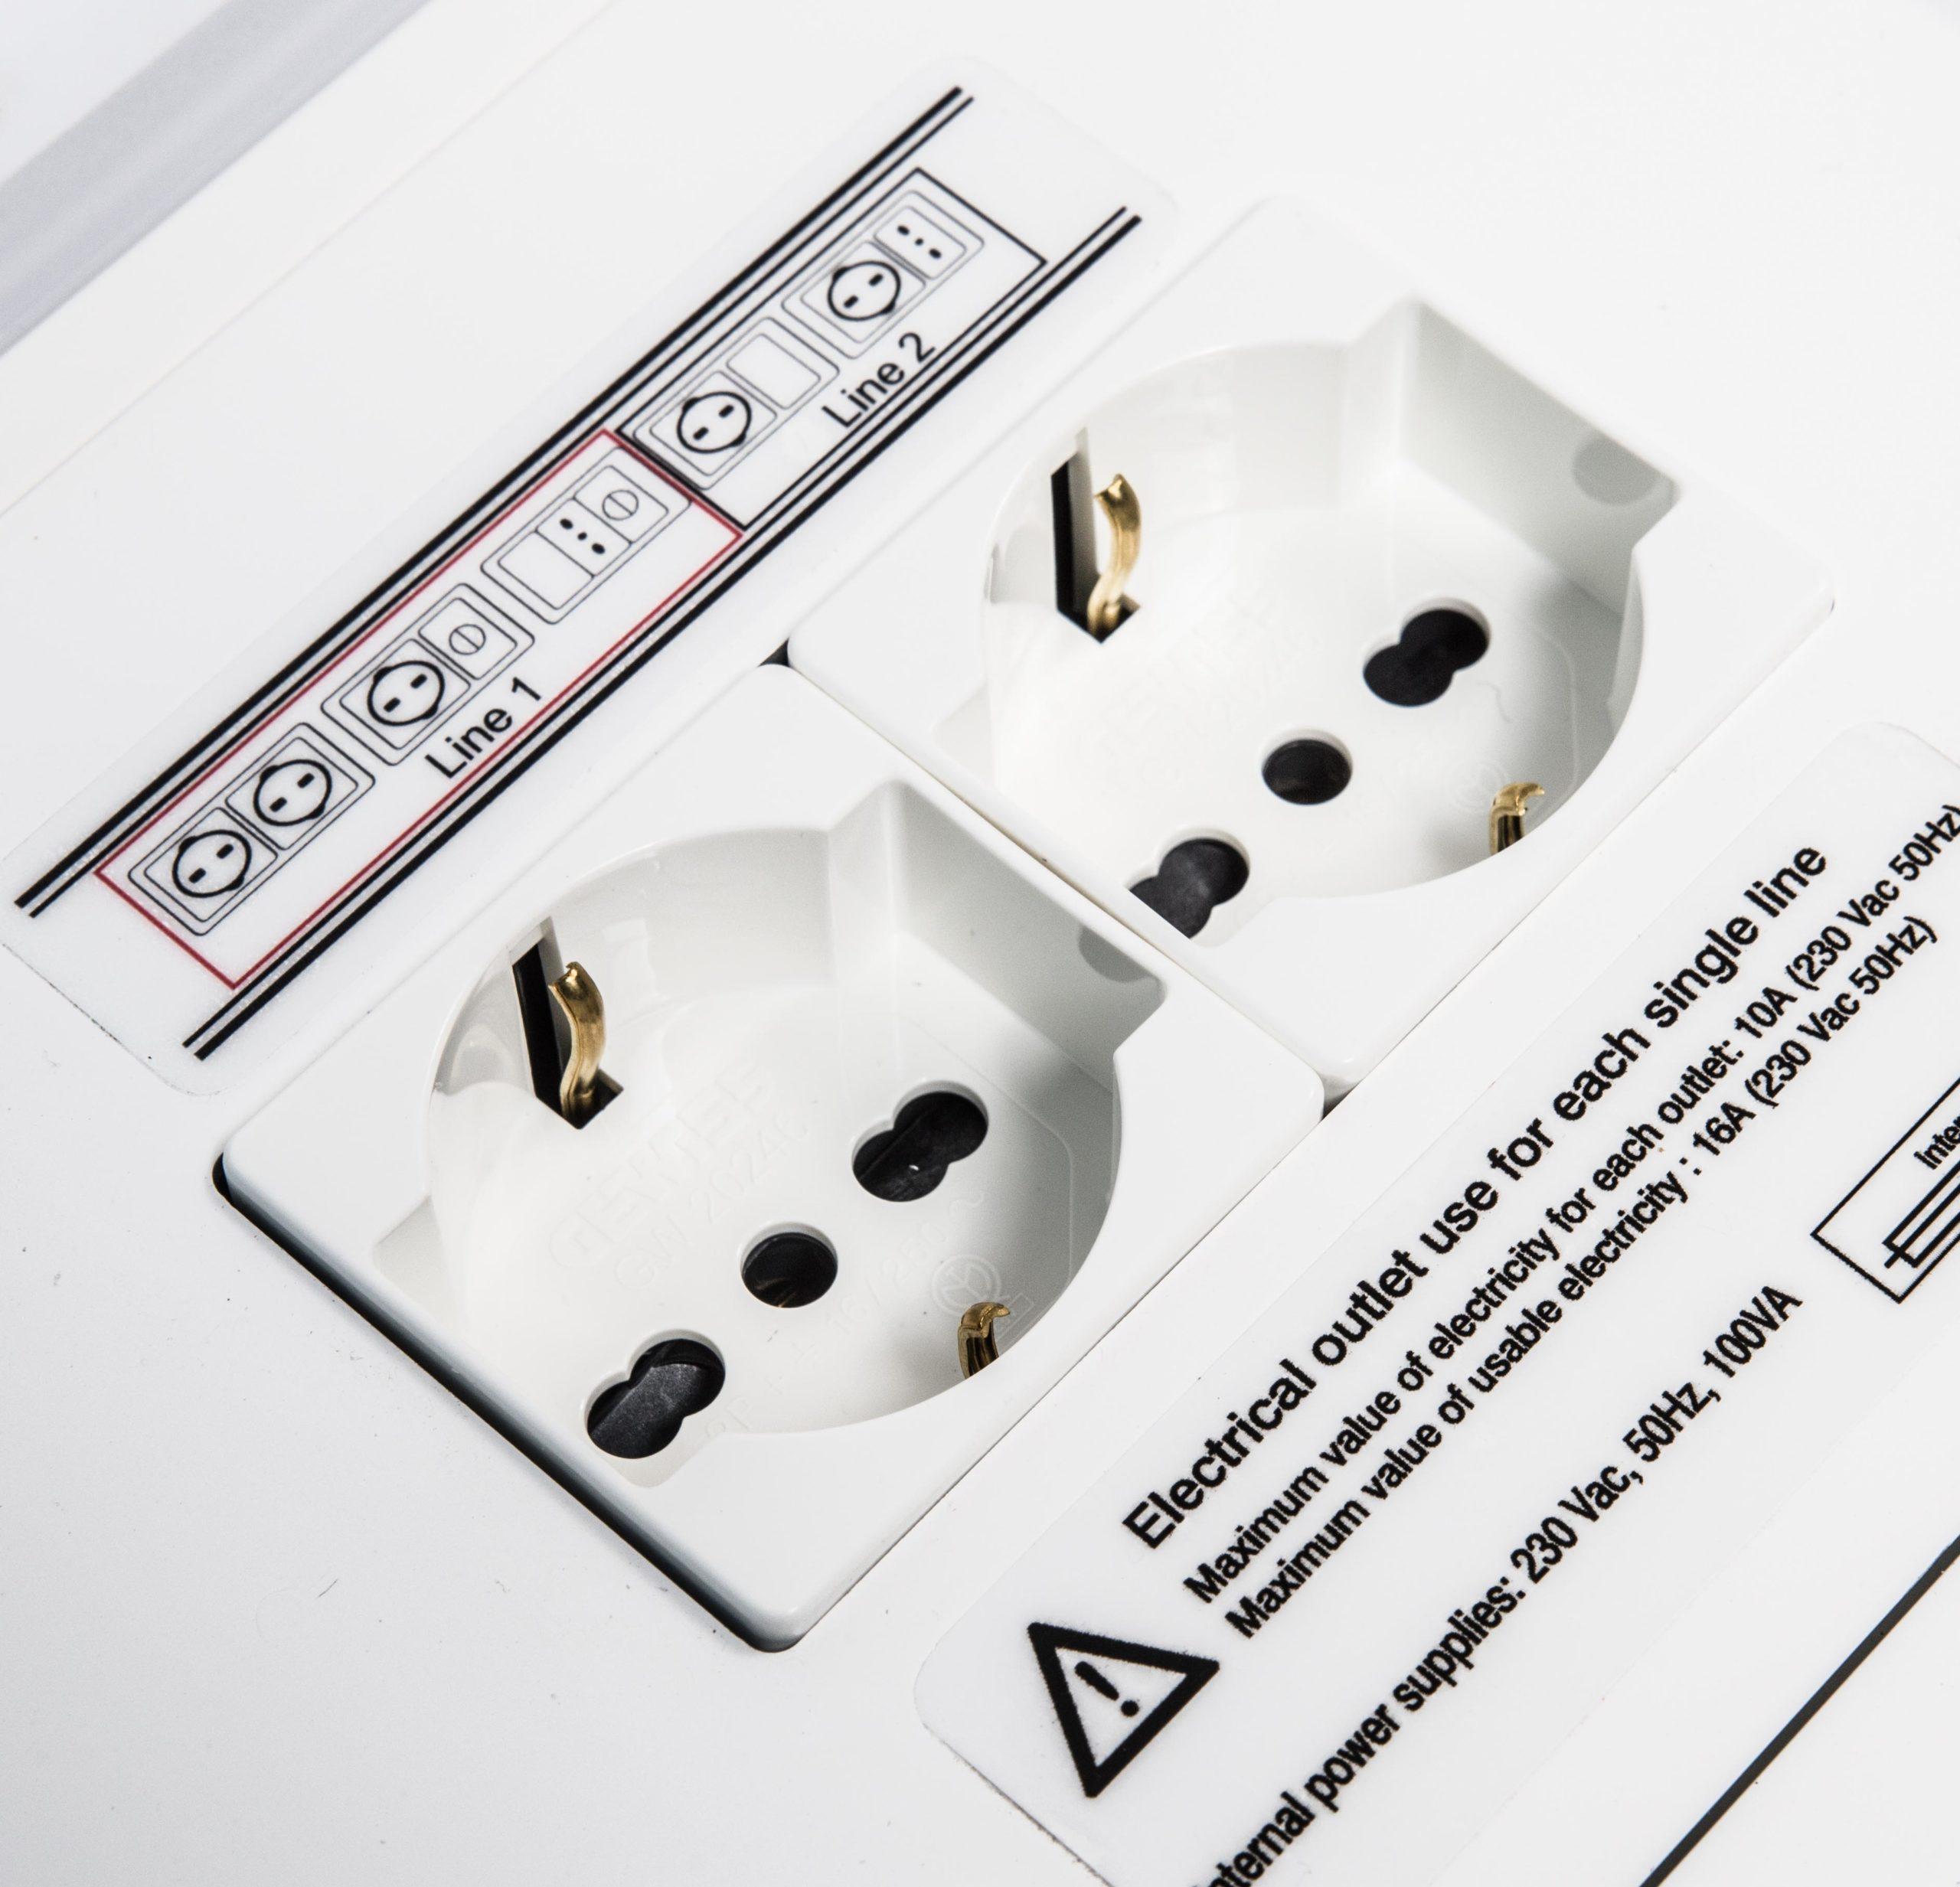 Dz Medicale - testaletto verticale dettaglio prese elettriche